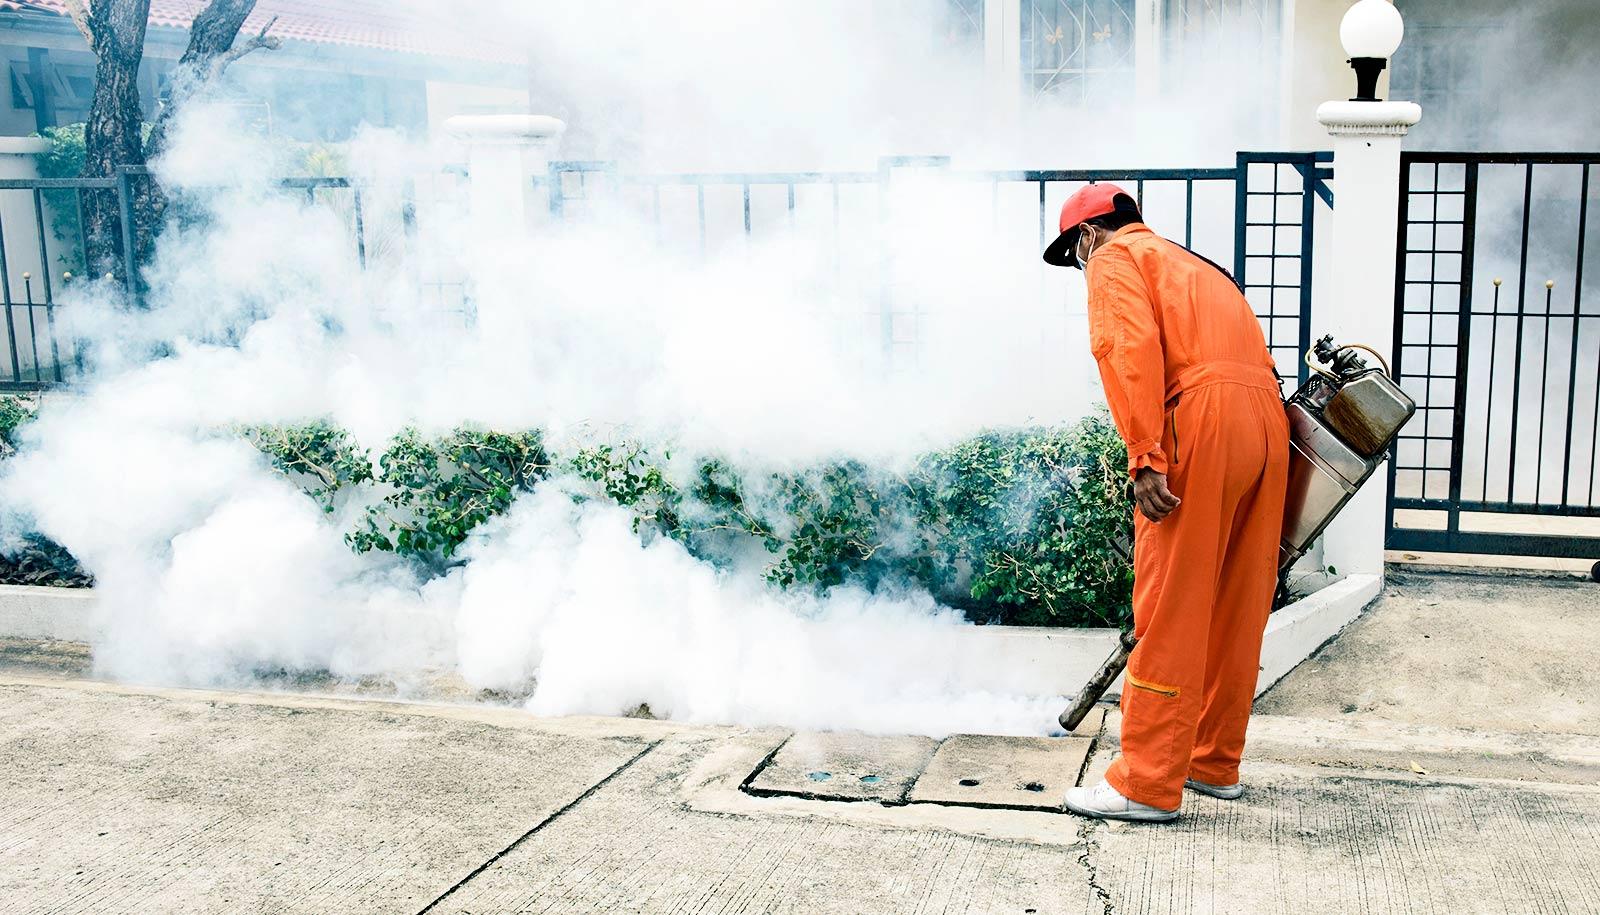 Crystal DDT could be a safer bug-killer - Futurity